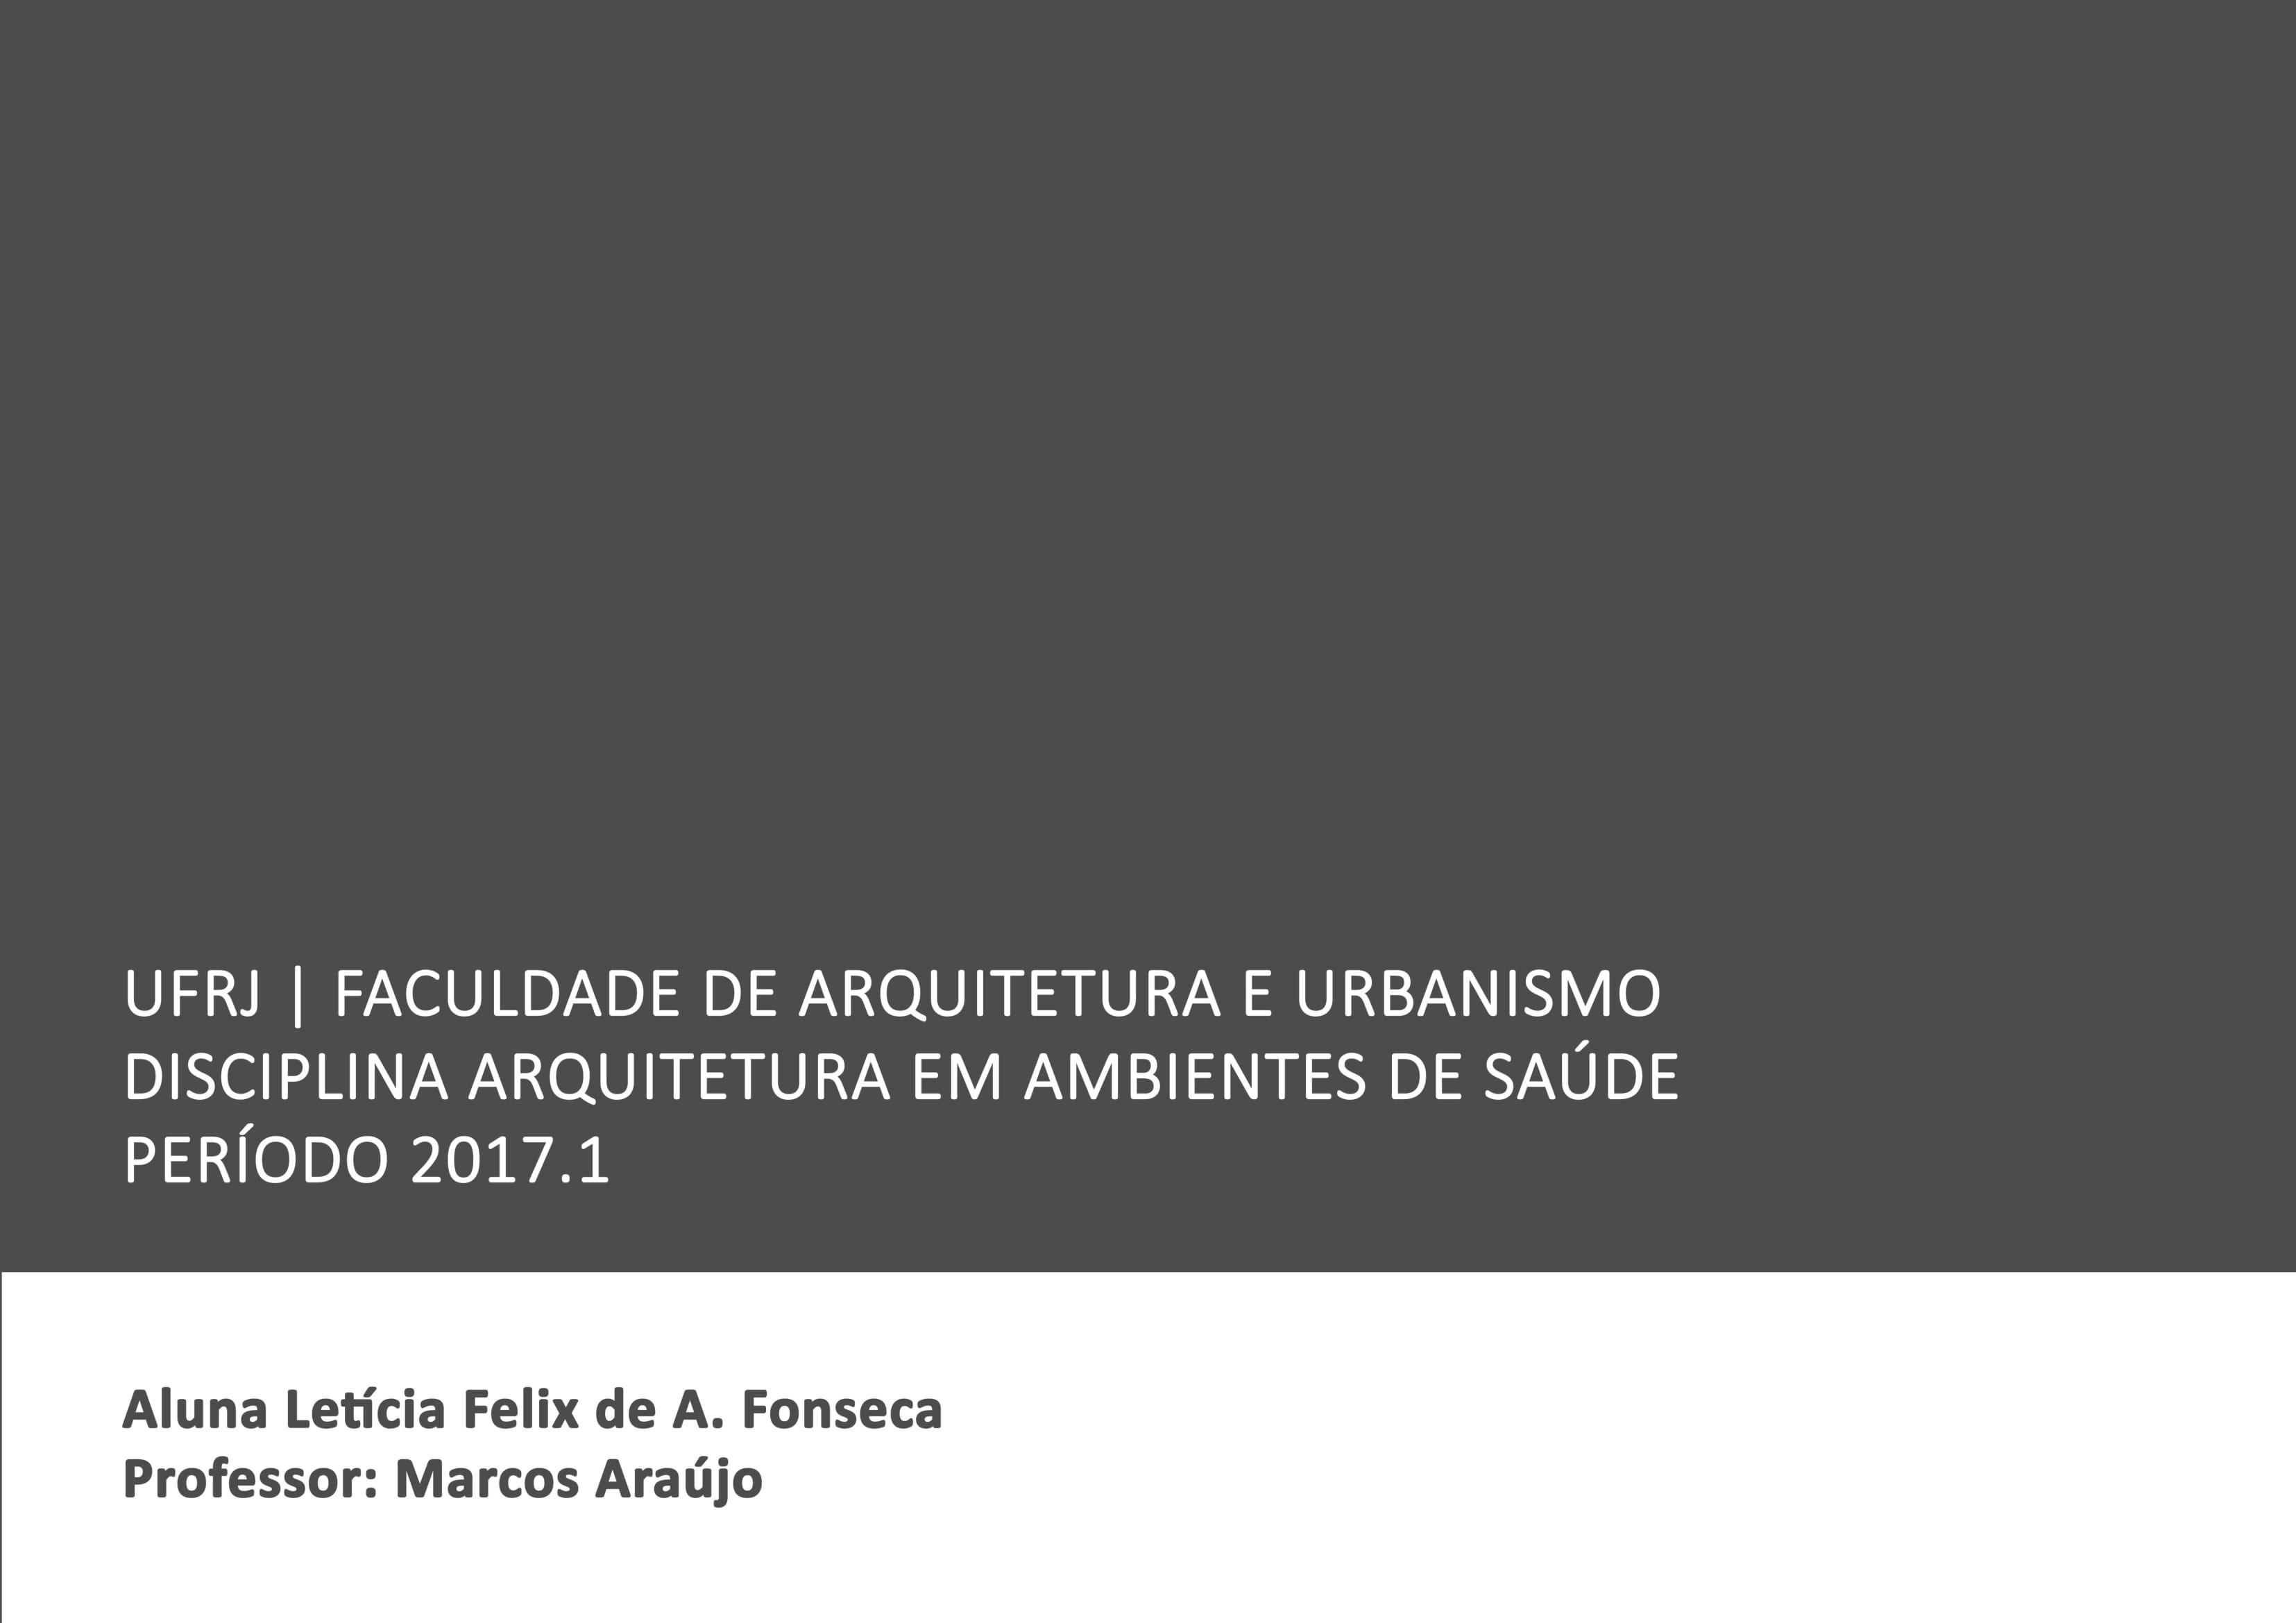 2017.1_paoptsaude_marcosaraujo_leticia felix a. fonseca-1